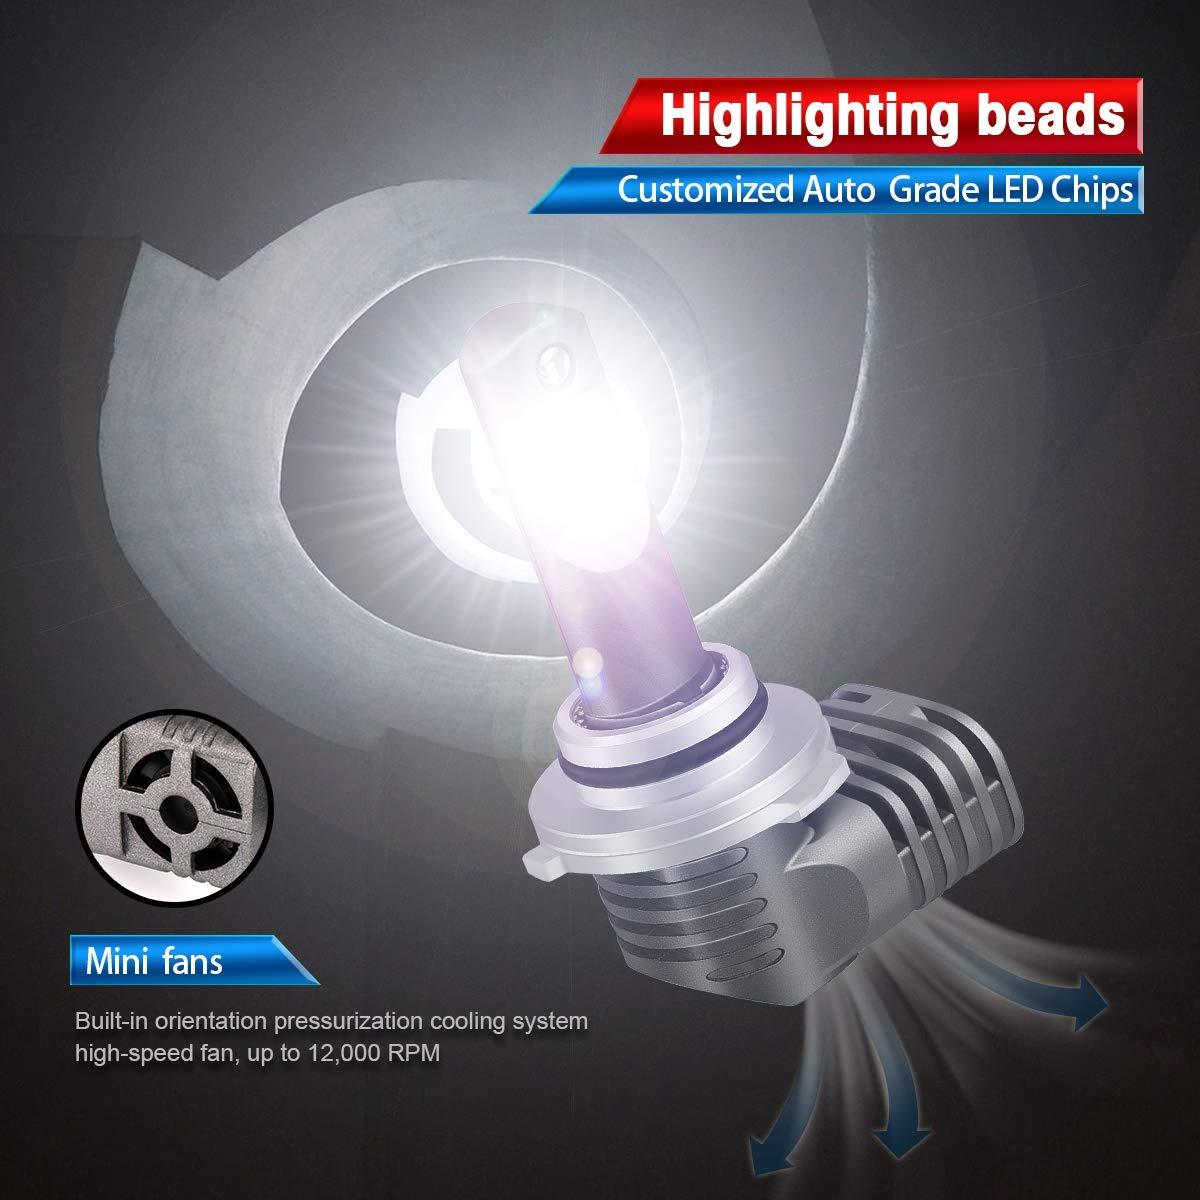 Easelook LED Headlight Bulbs Factory - 9003(H4/HB2), 9004(HB1), 9007(HB5), 9008( H13). Single Beam: H7, H11(H8/H9/H16), 9005(HB3), 9006( HB4), 9012(HIR2), H1, H3 etc